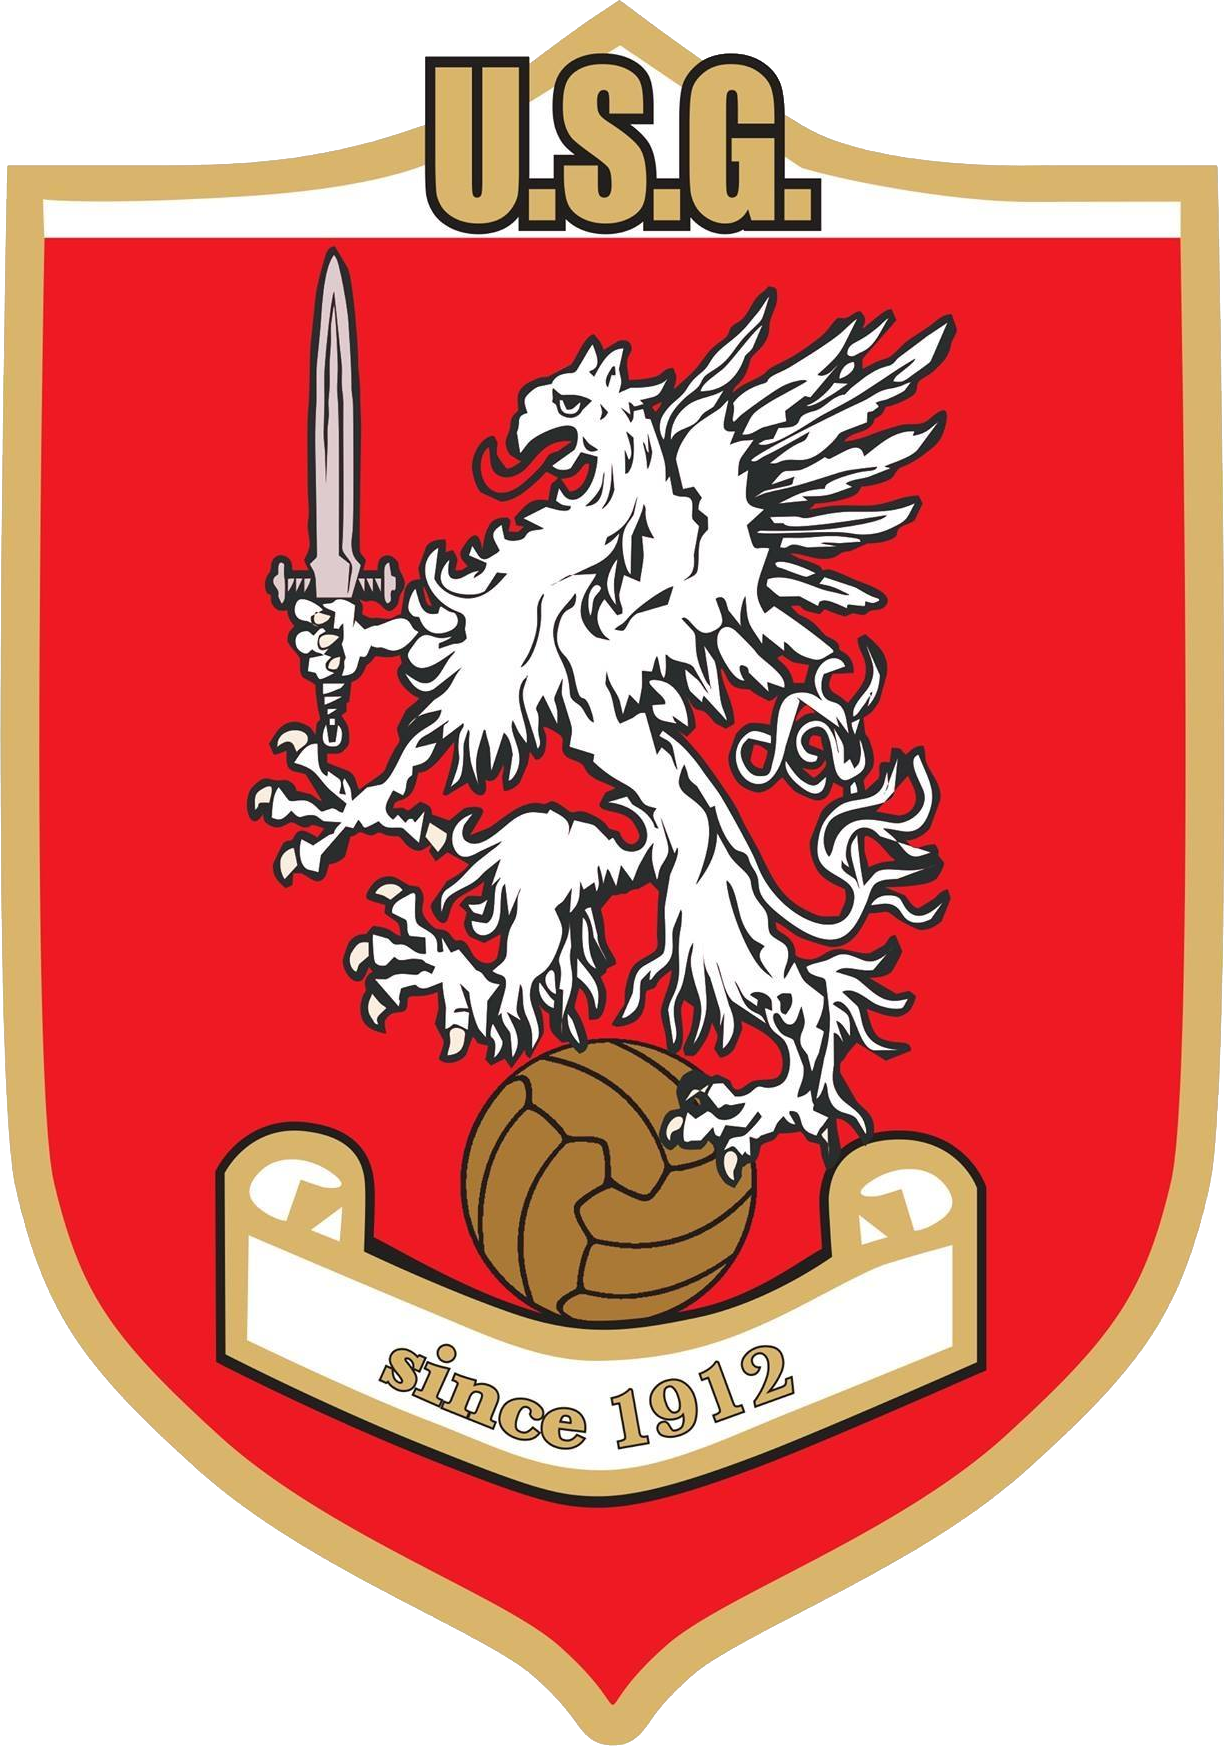 Unione Sportiva Grosseto 1912